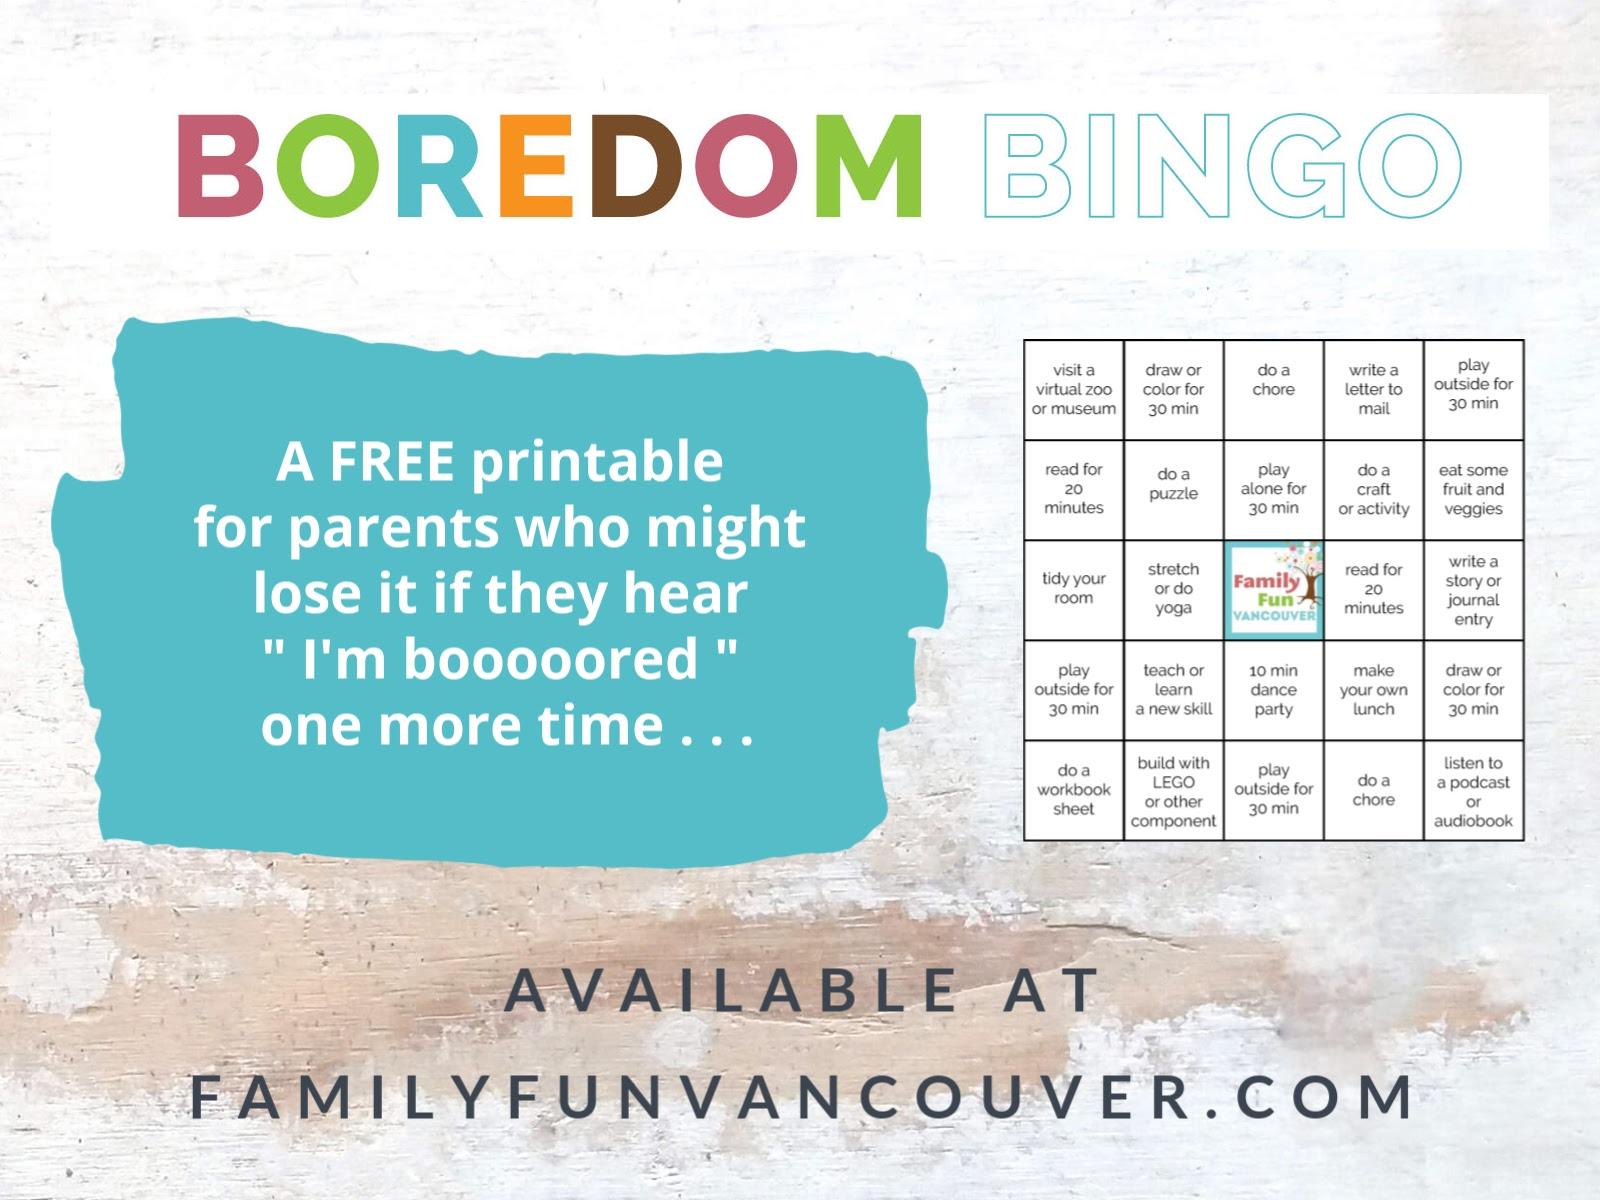 Boredom Bingo With Free Printable